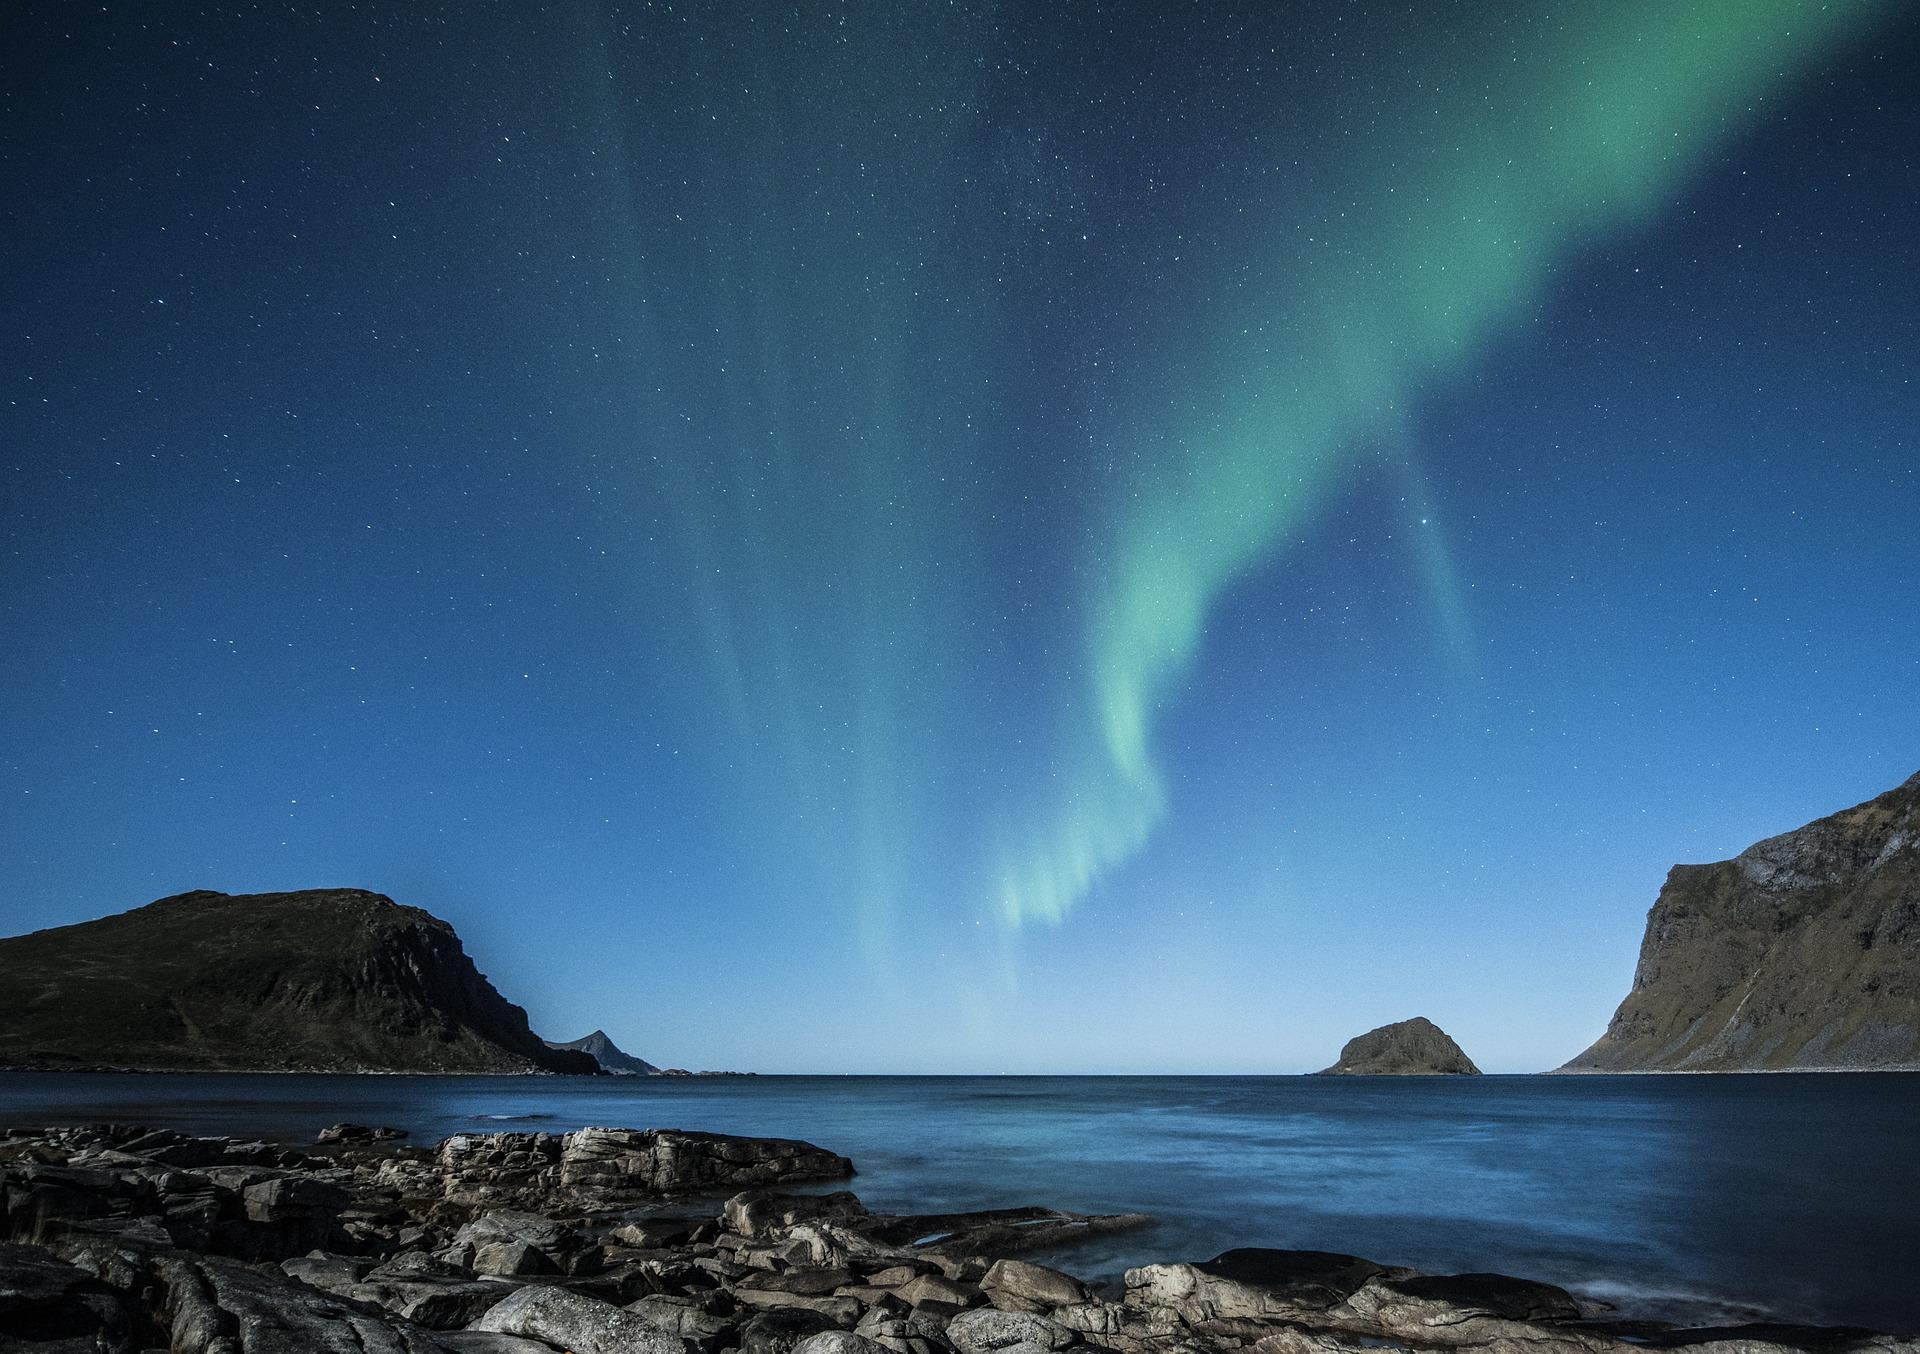 aurora-borealis-1032523_1920.jpg